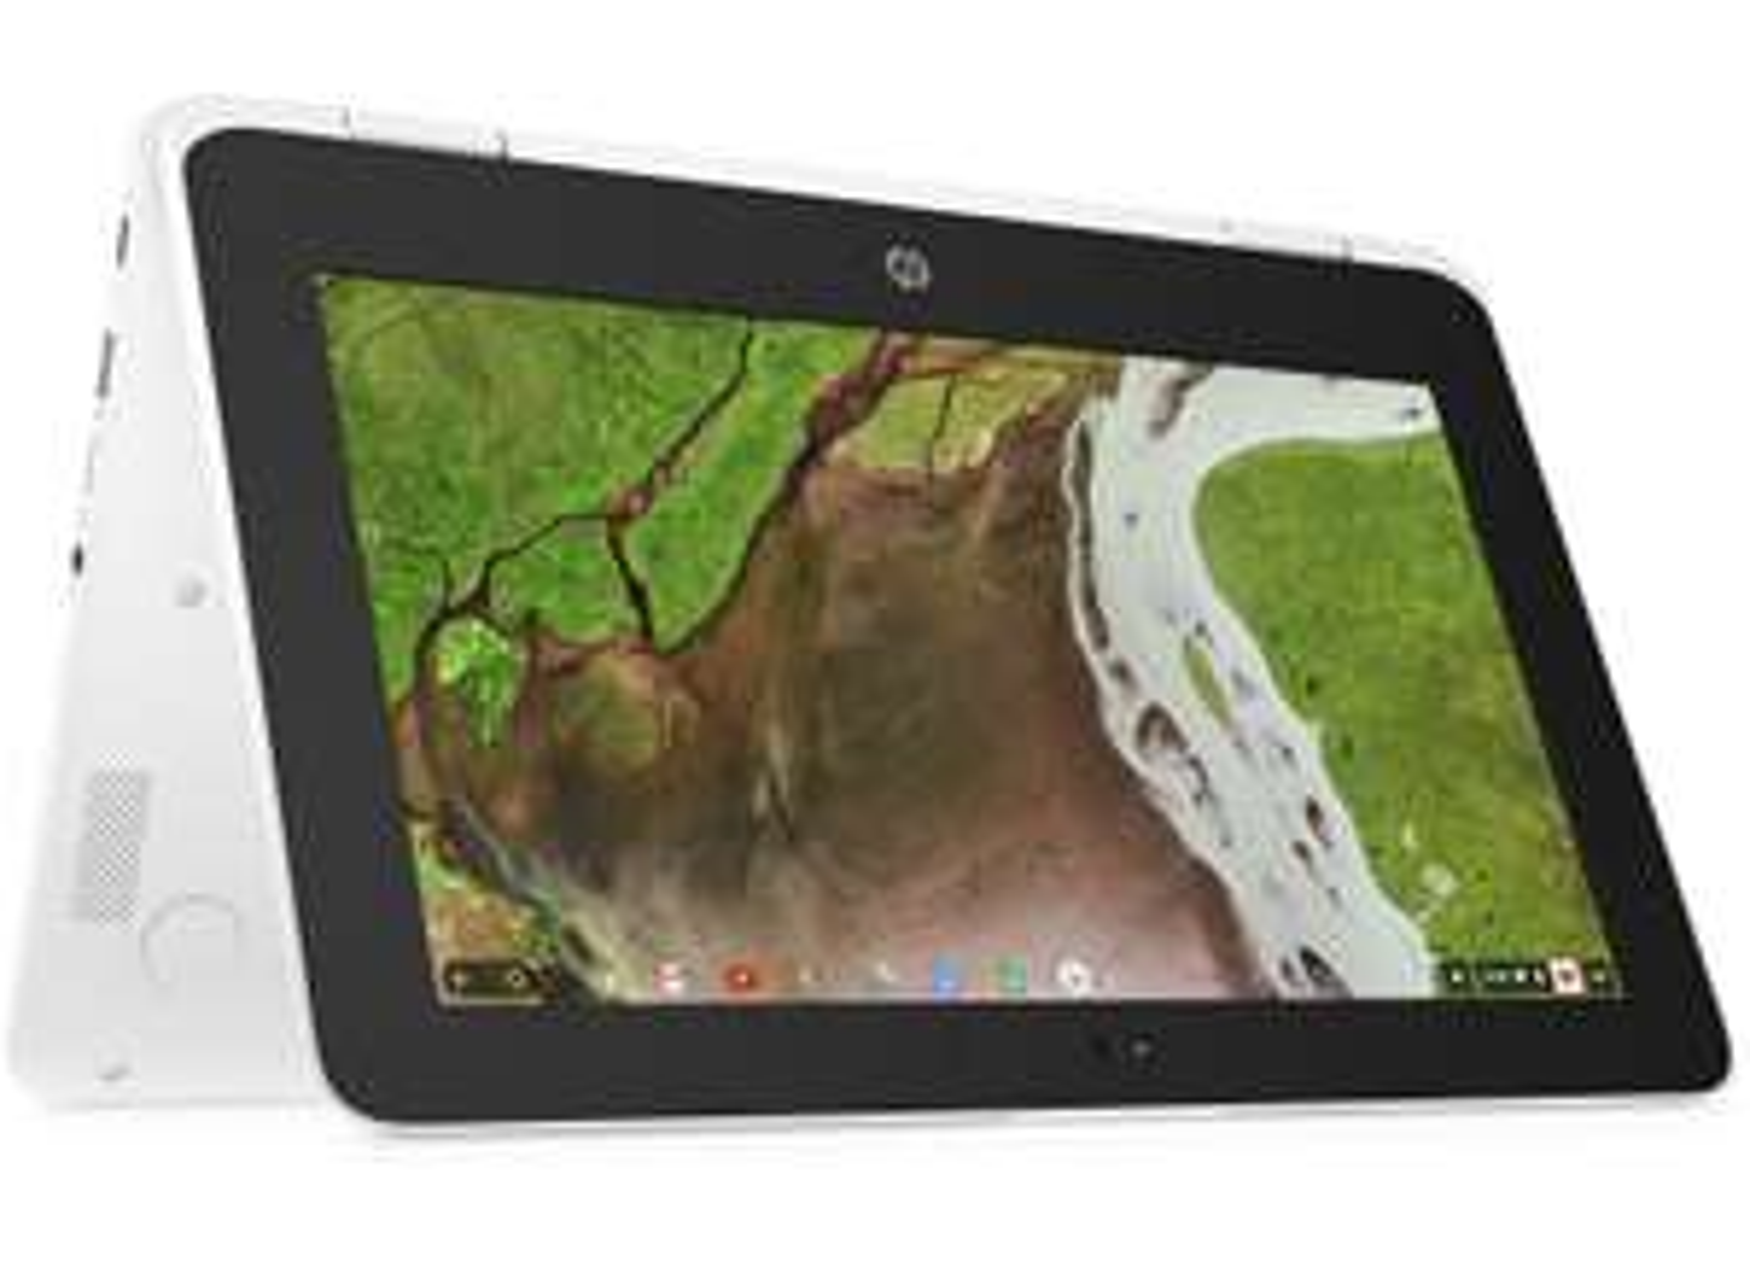 HP Chromebook x360 11-ae031nd met Touchscreen